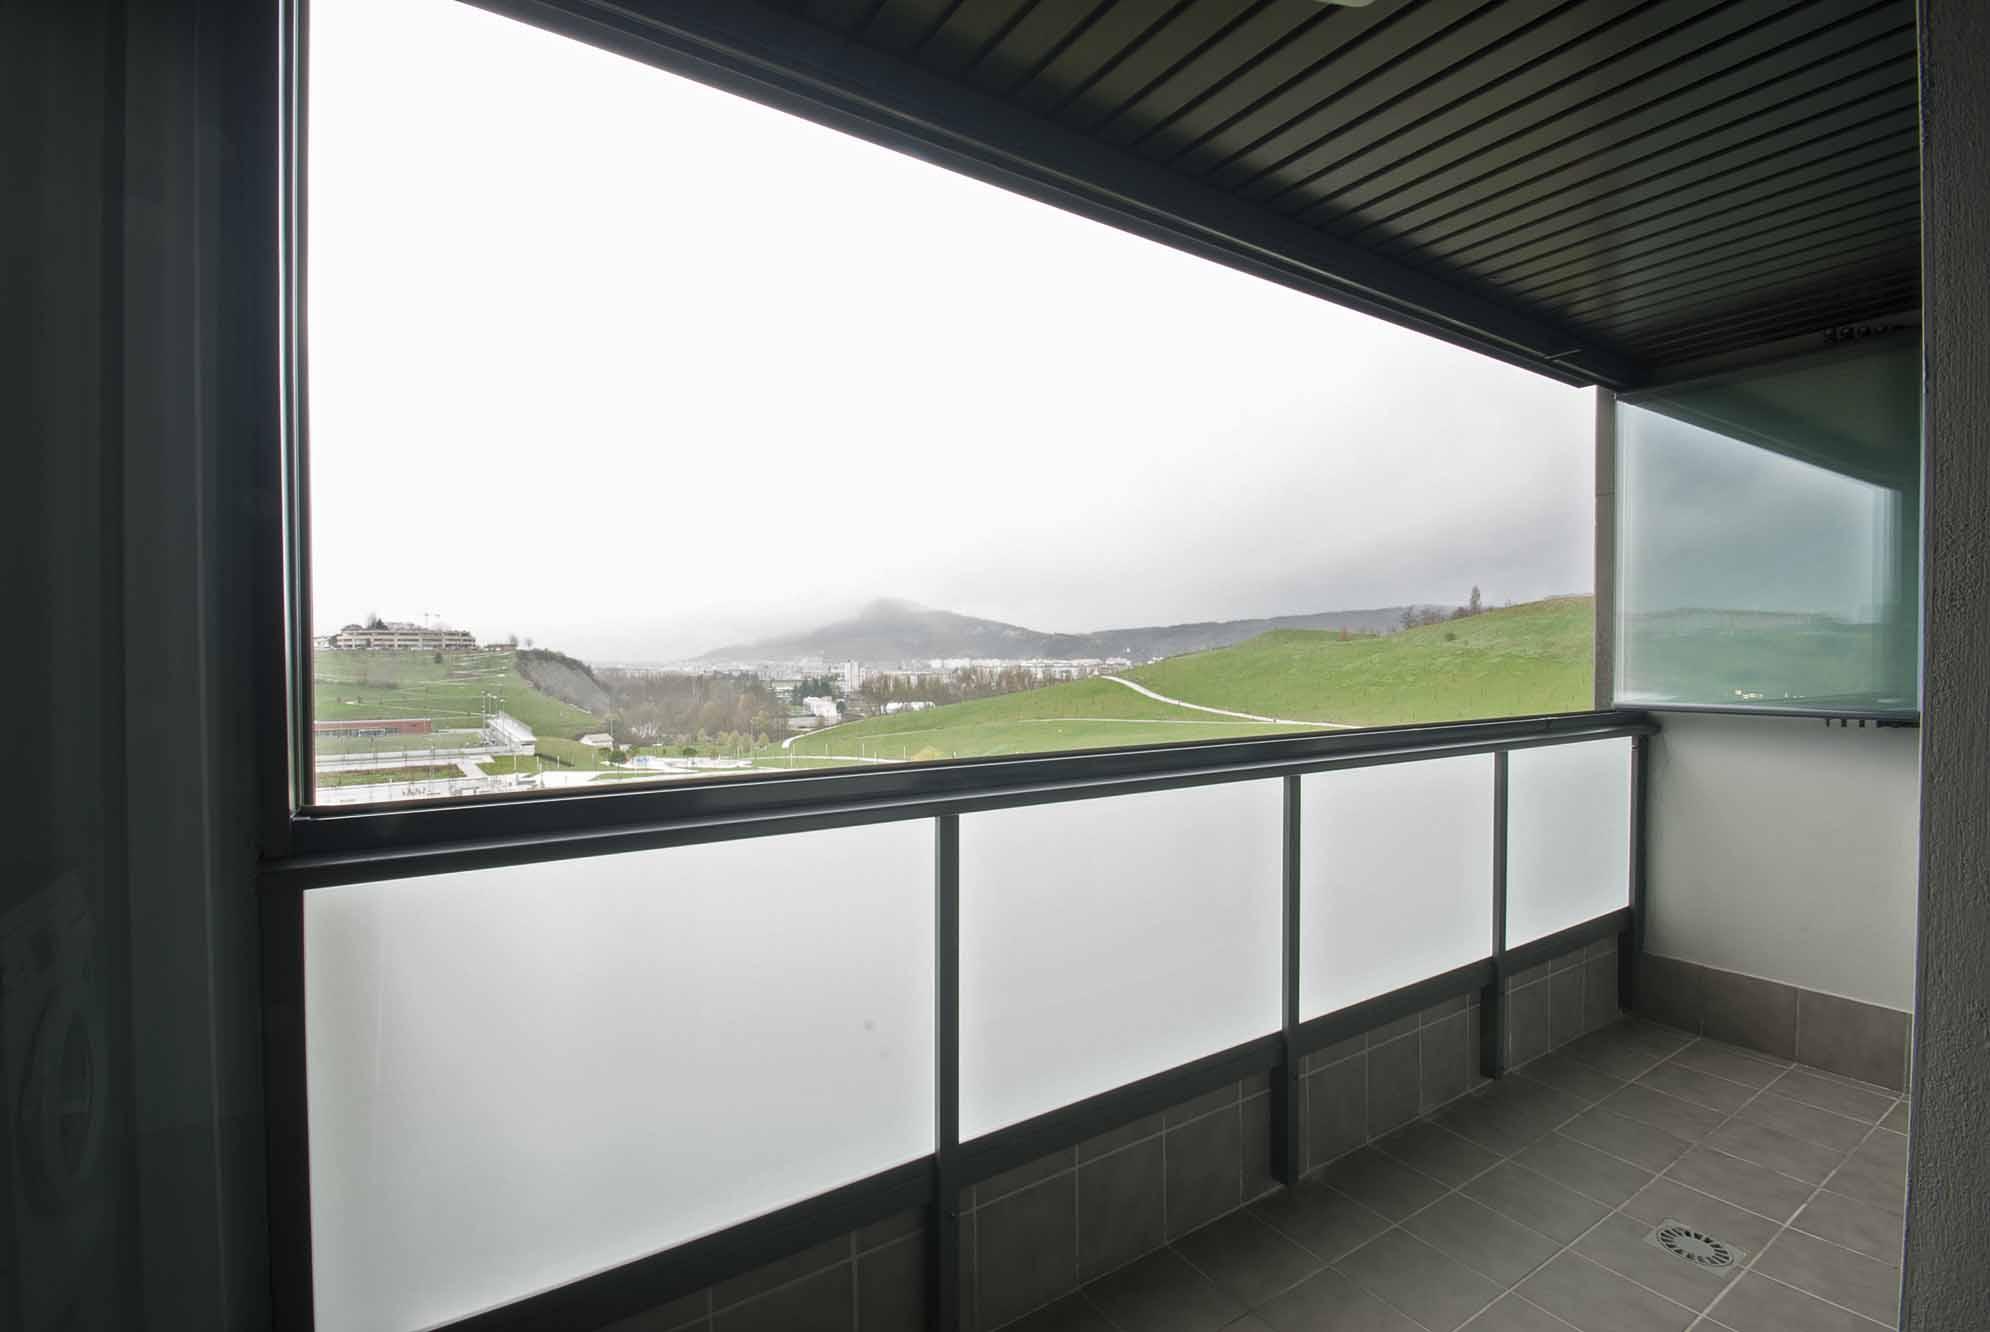 cerramientos-cristal-terrazas-viviendas-navarra-4